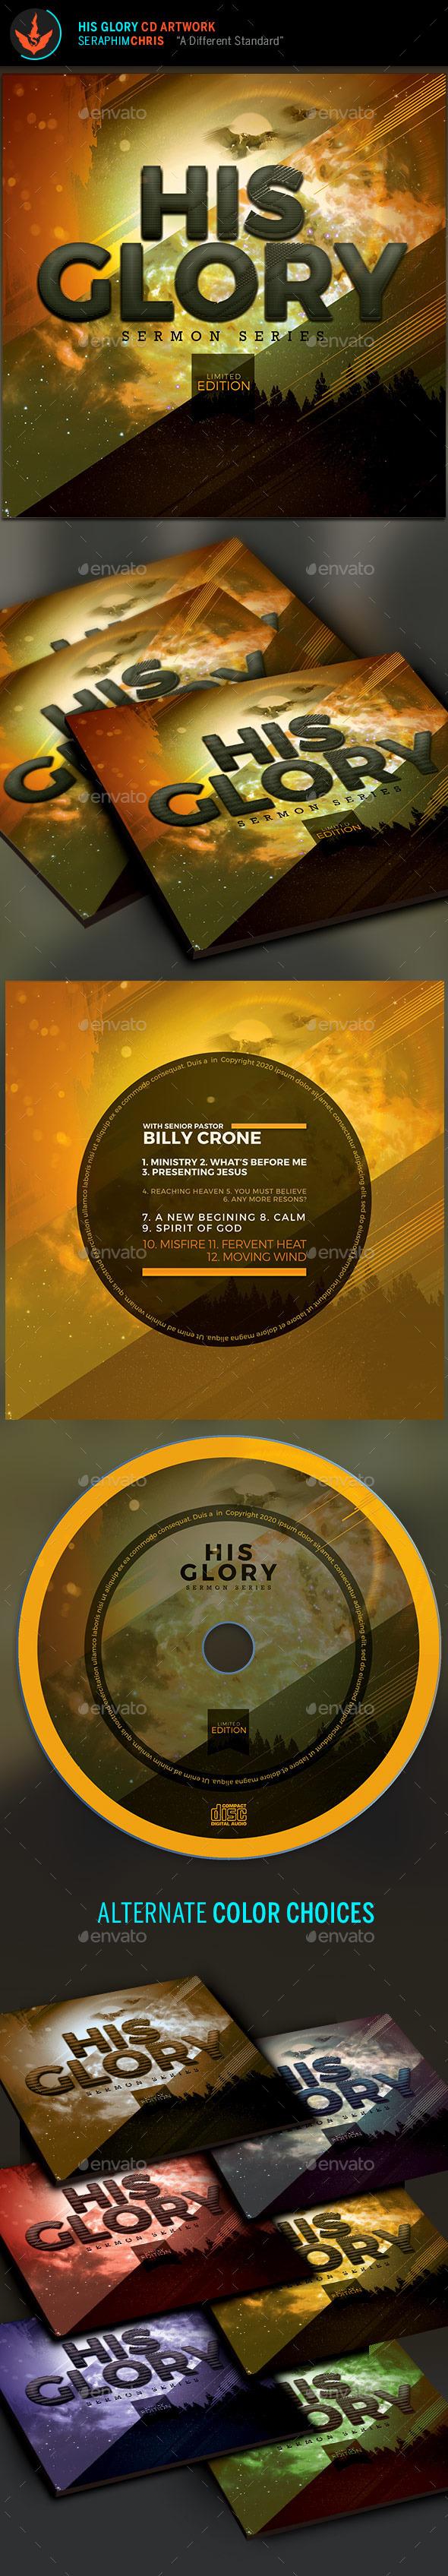 His Glory: CD Artwork Template - CD & DVD Artwork Print Templates